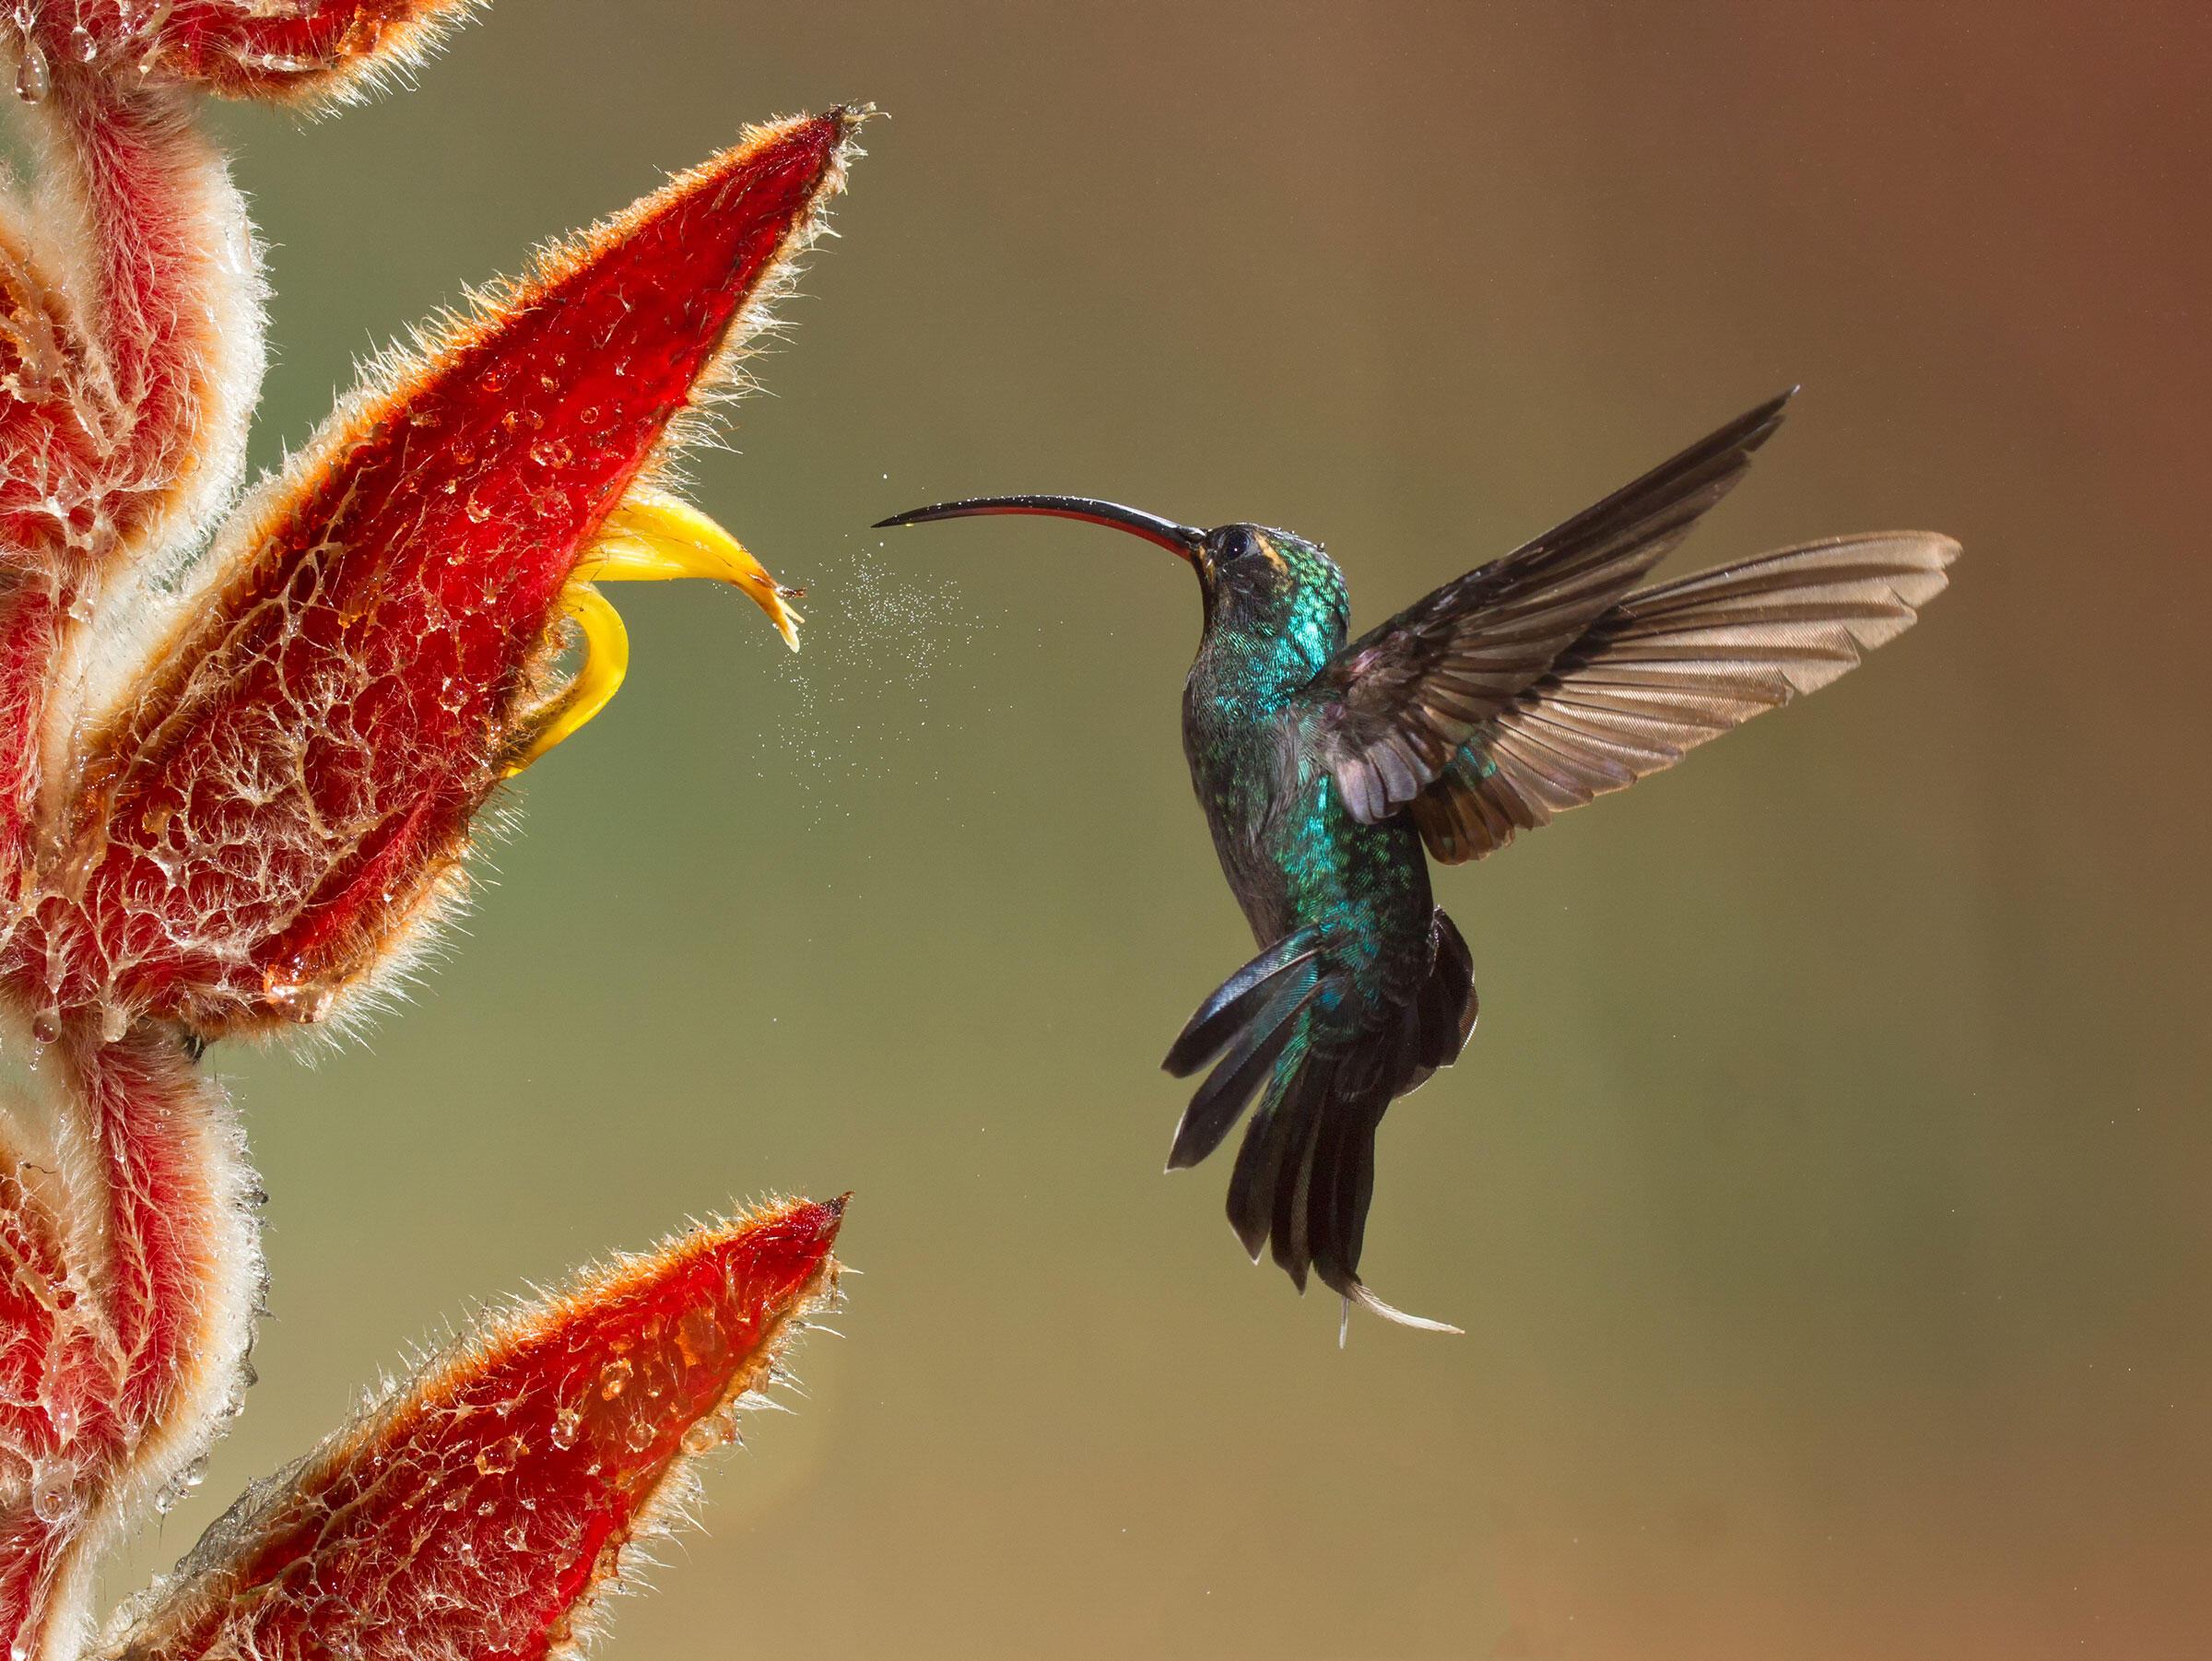 Green Hermit/Amateur Category. Cathy Desrochers/Audubon Photography Awards